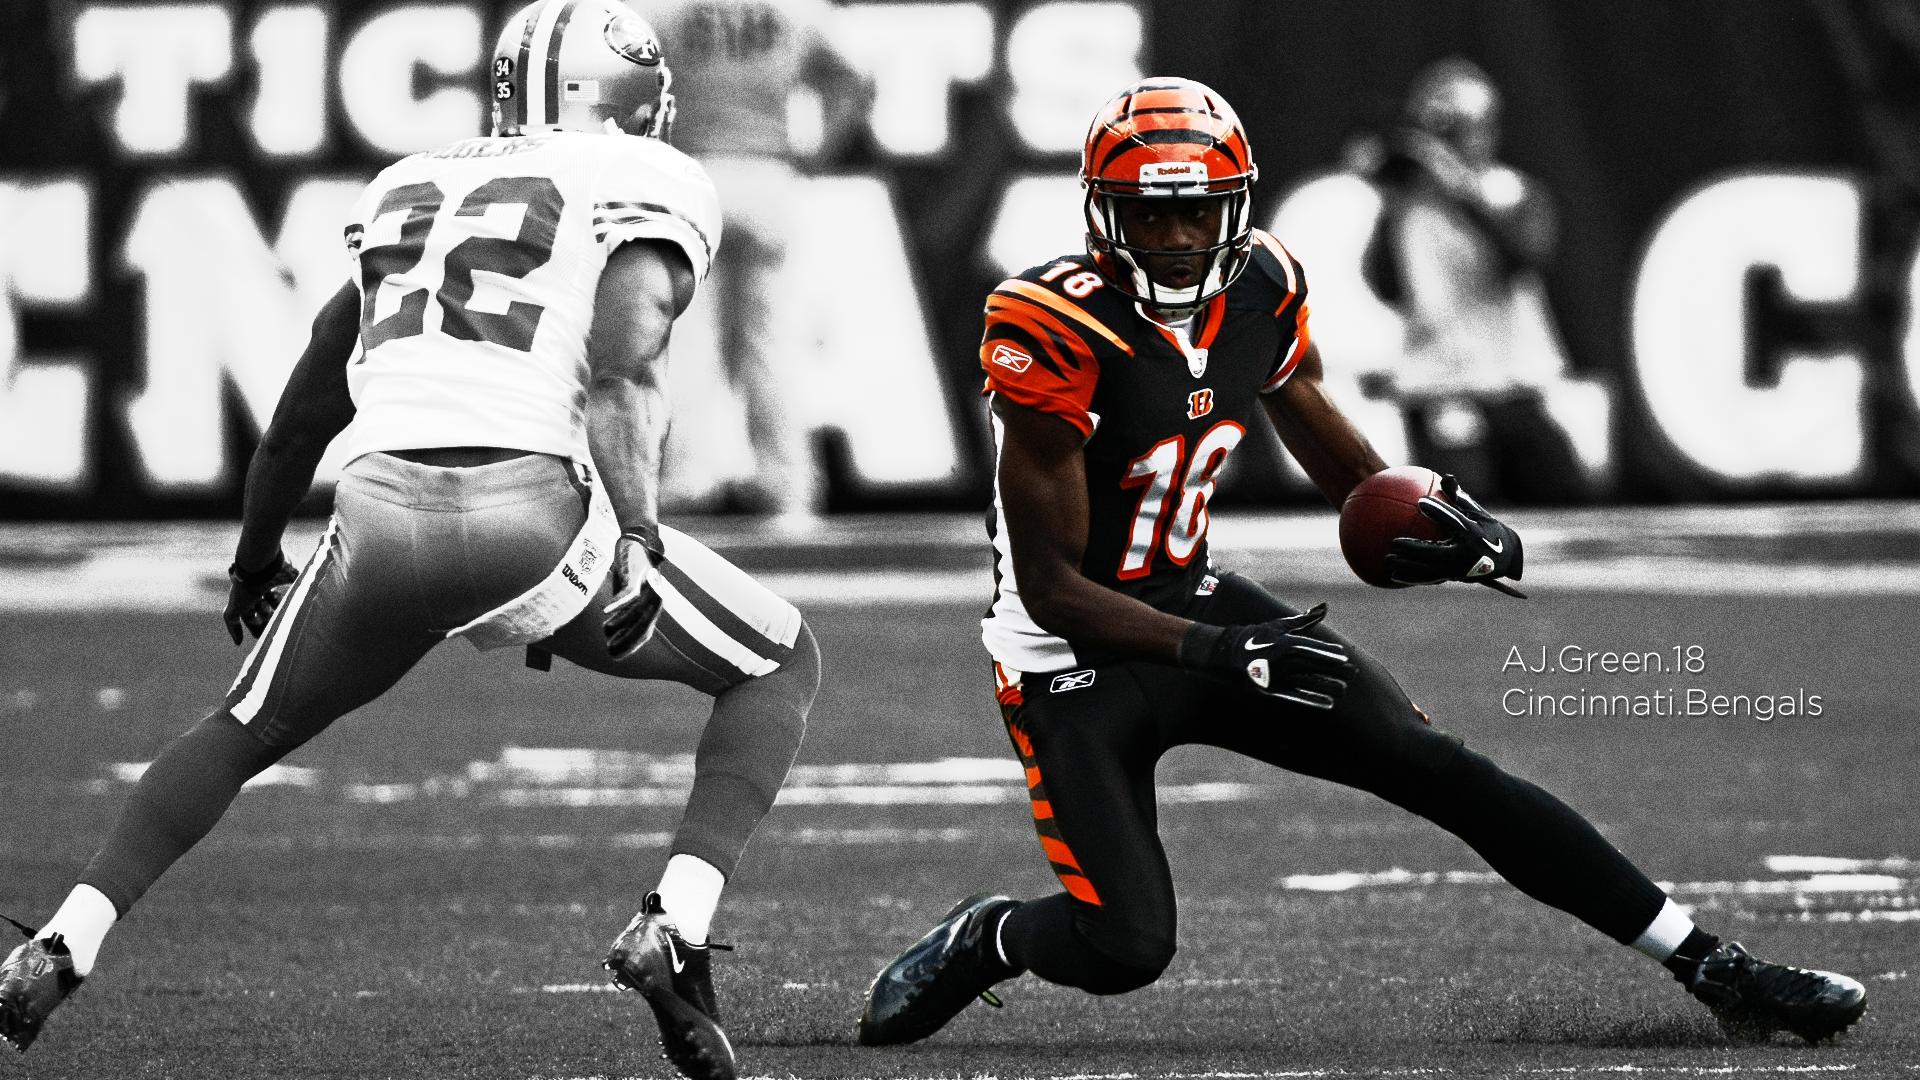 Nfl Free Computer Wallpaper Cincinnati Bengals Football Tops Football Background